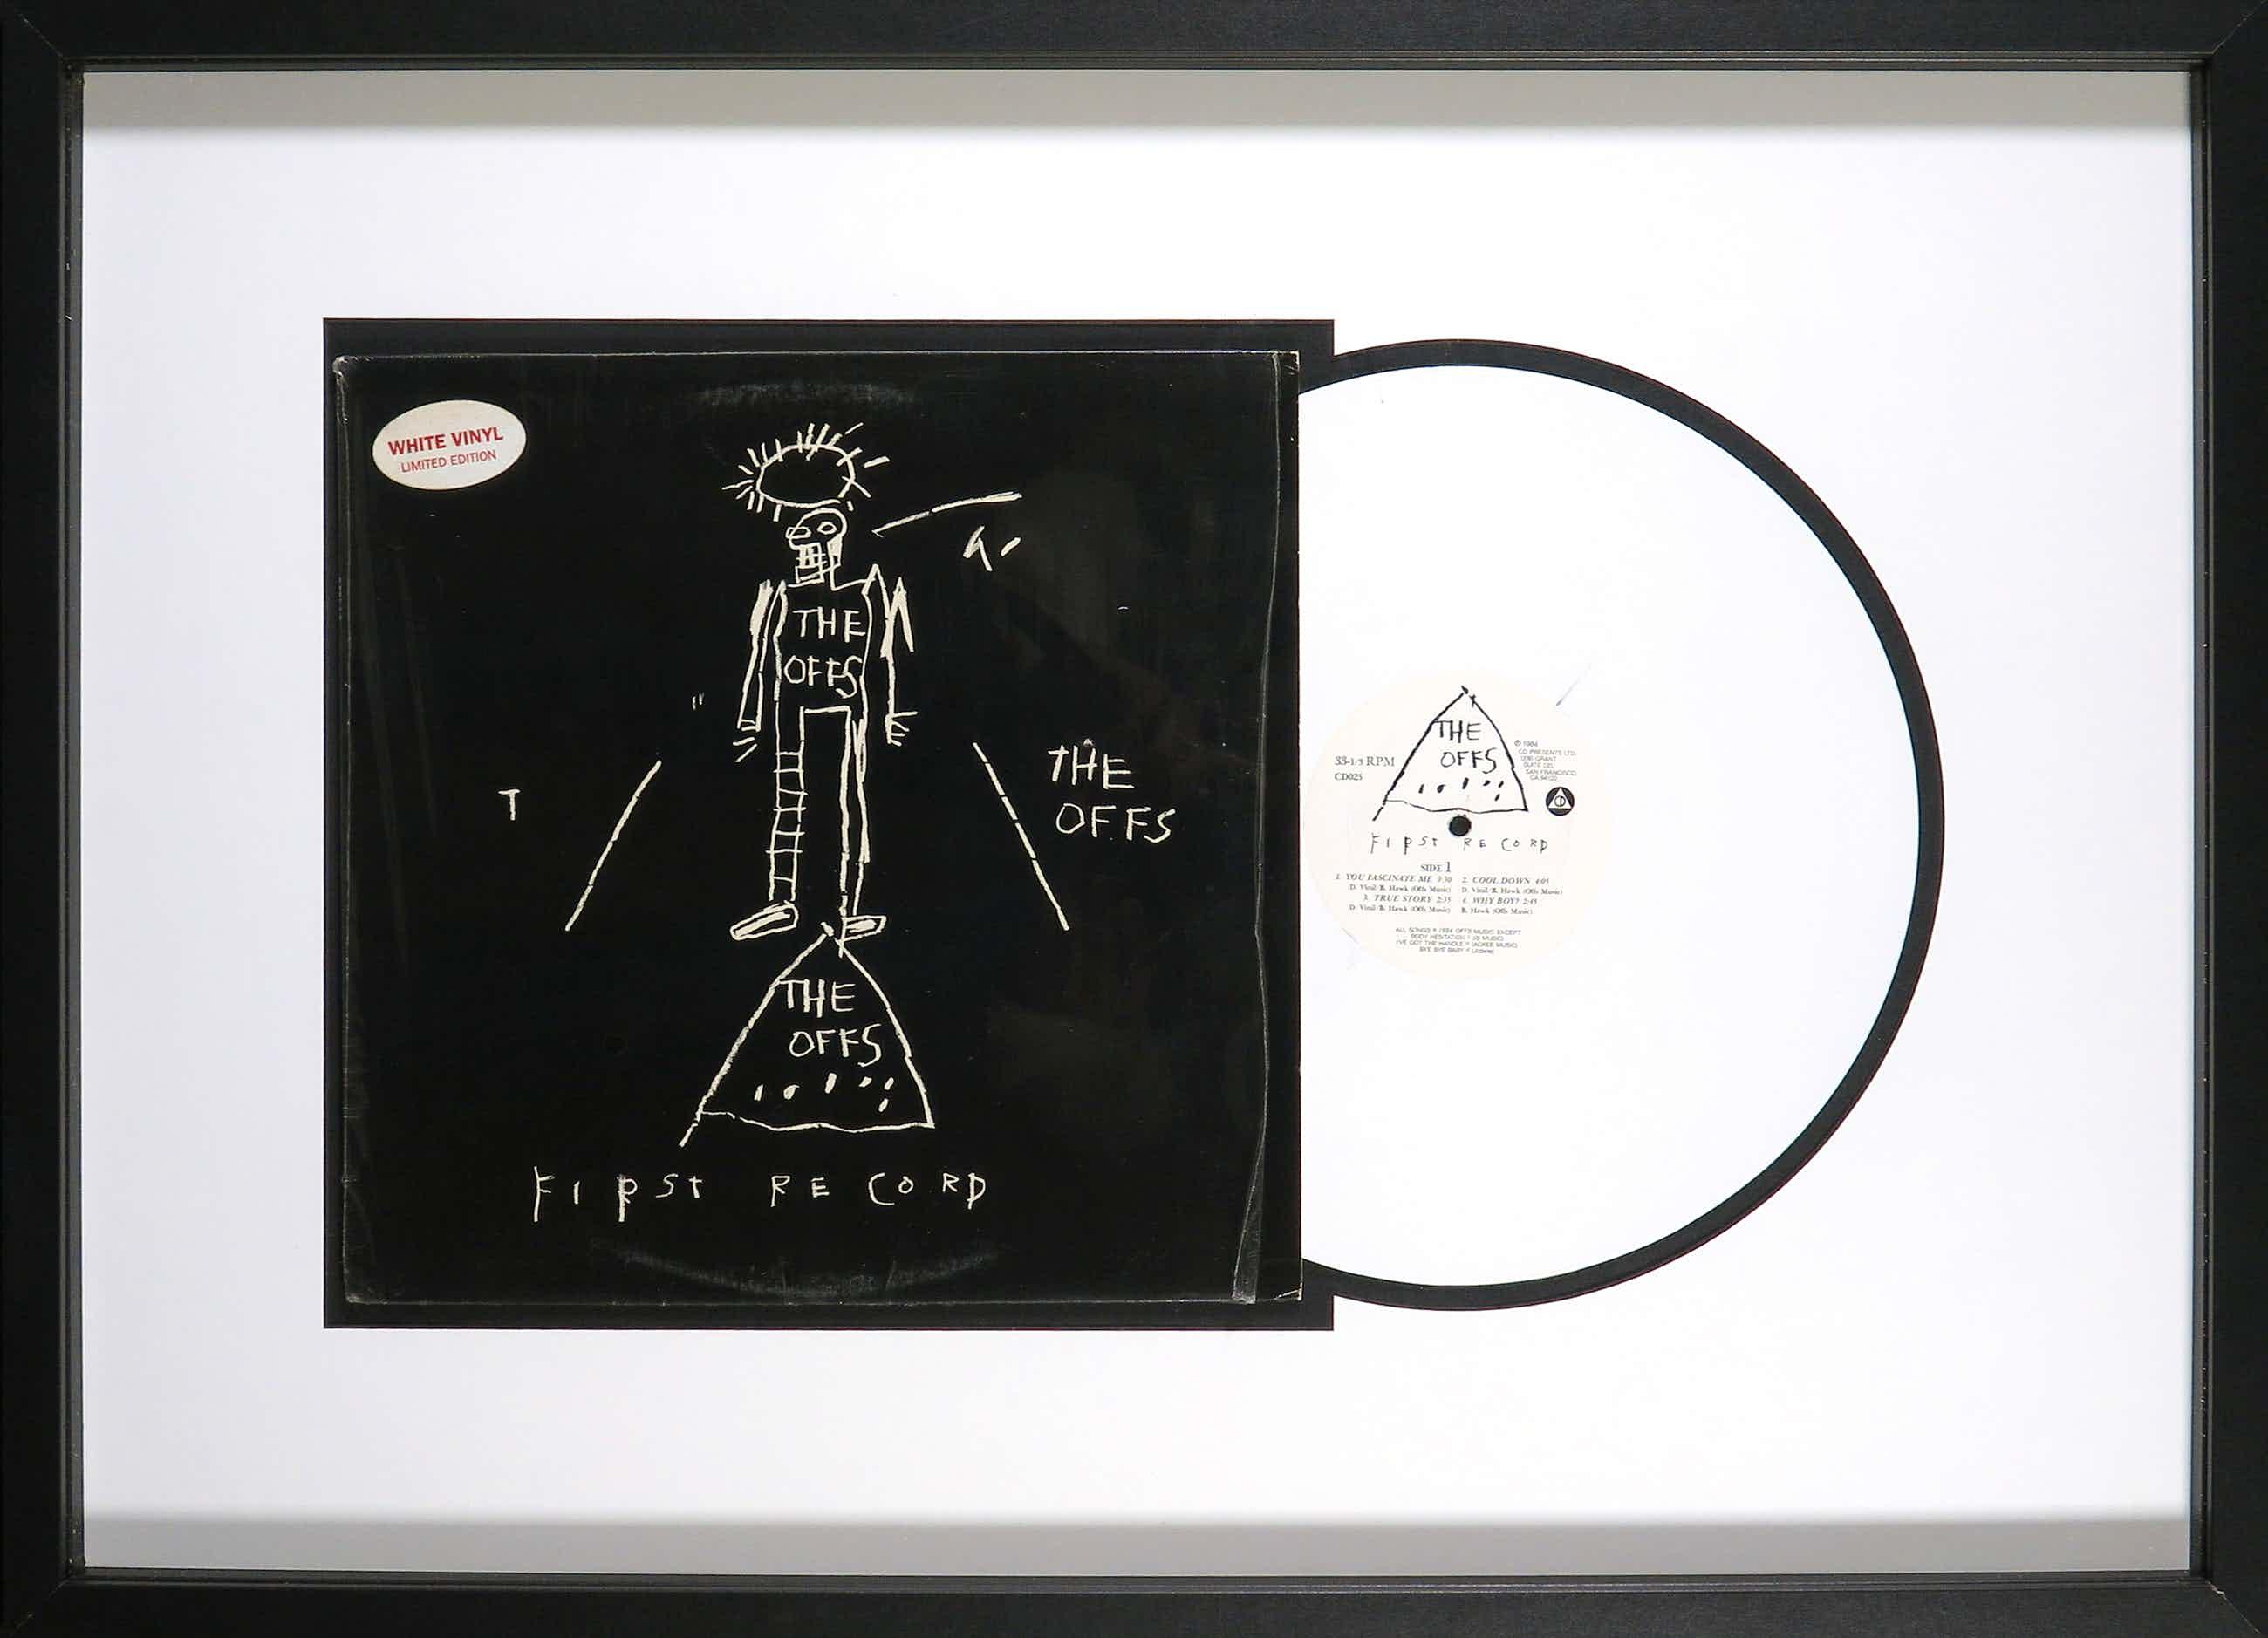 Jean-Michel Basquiat - The Offs: First Record - Originele White Vinyl pressing - Ingelijst kopen? Bied vanaf 383!